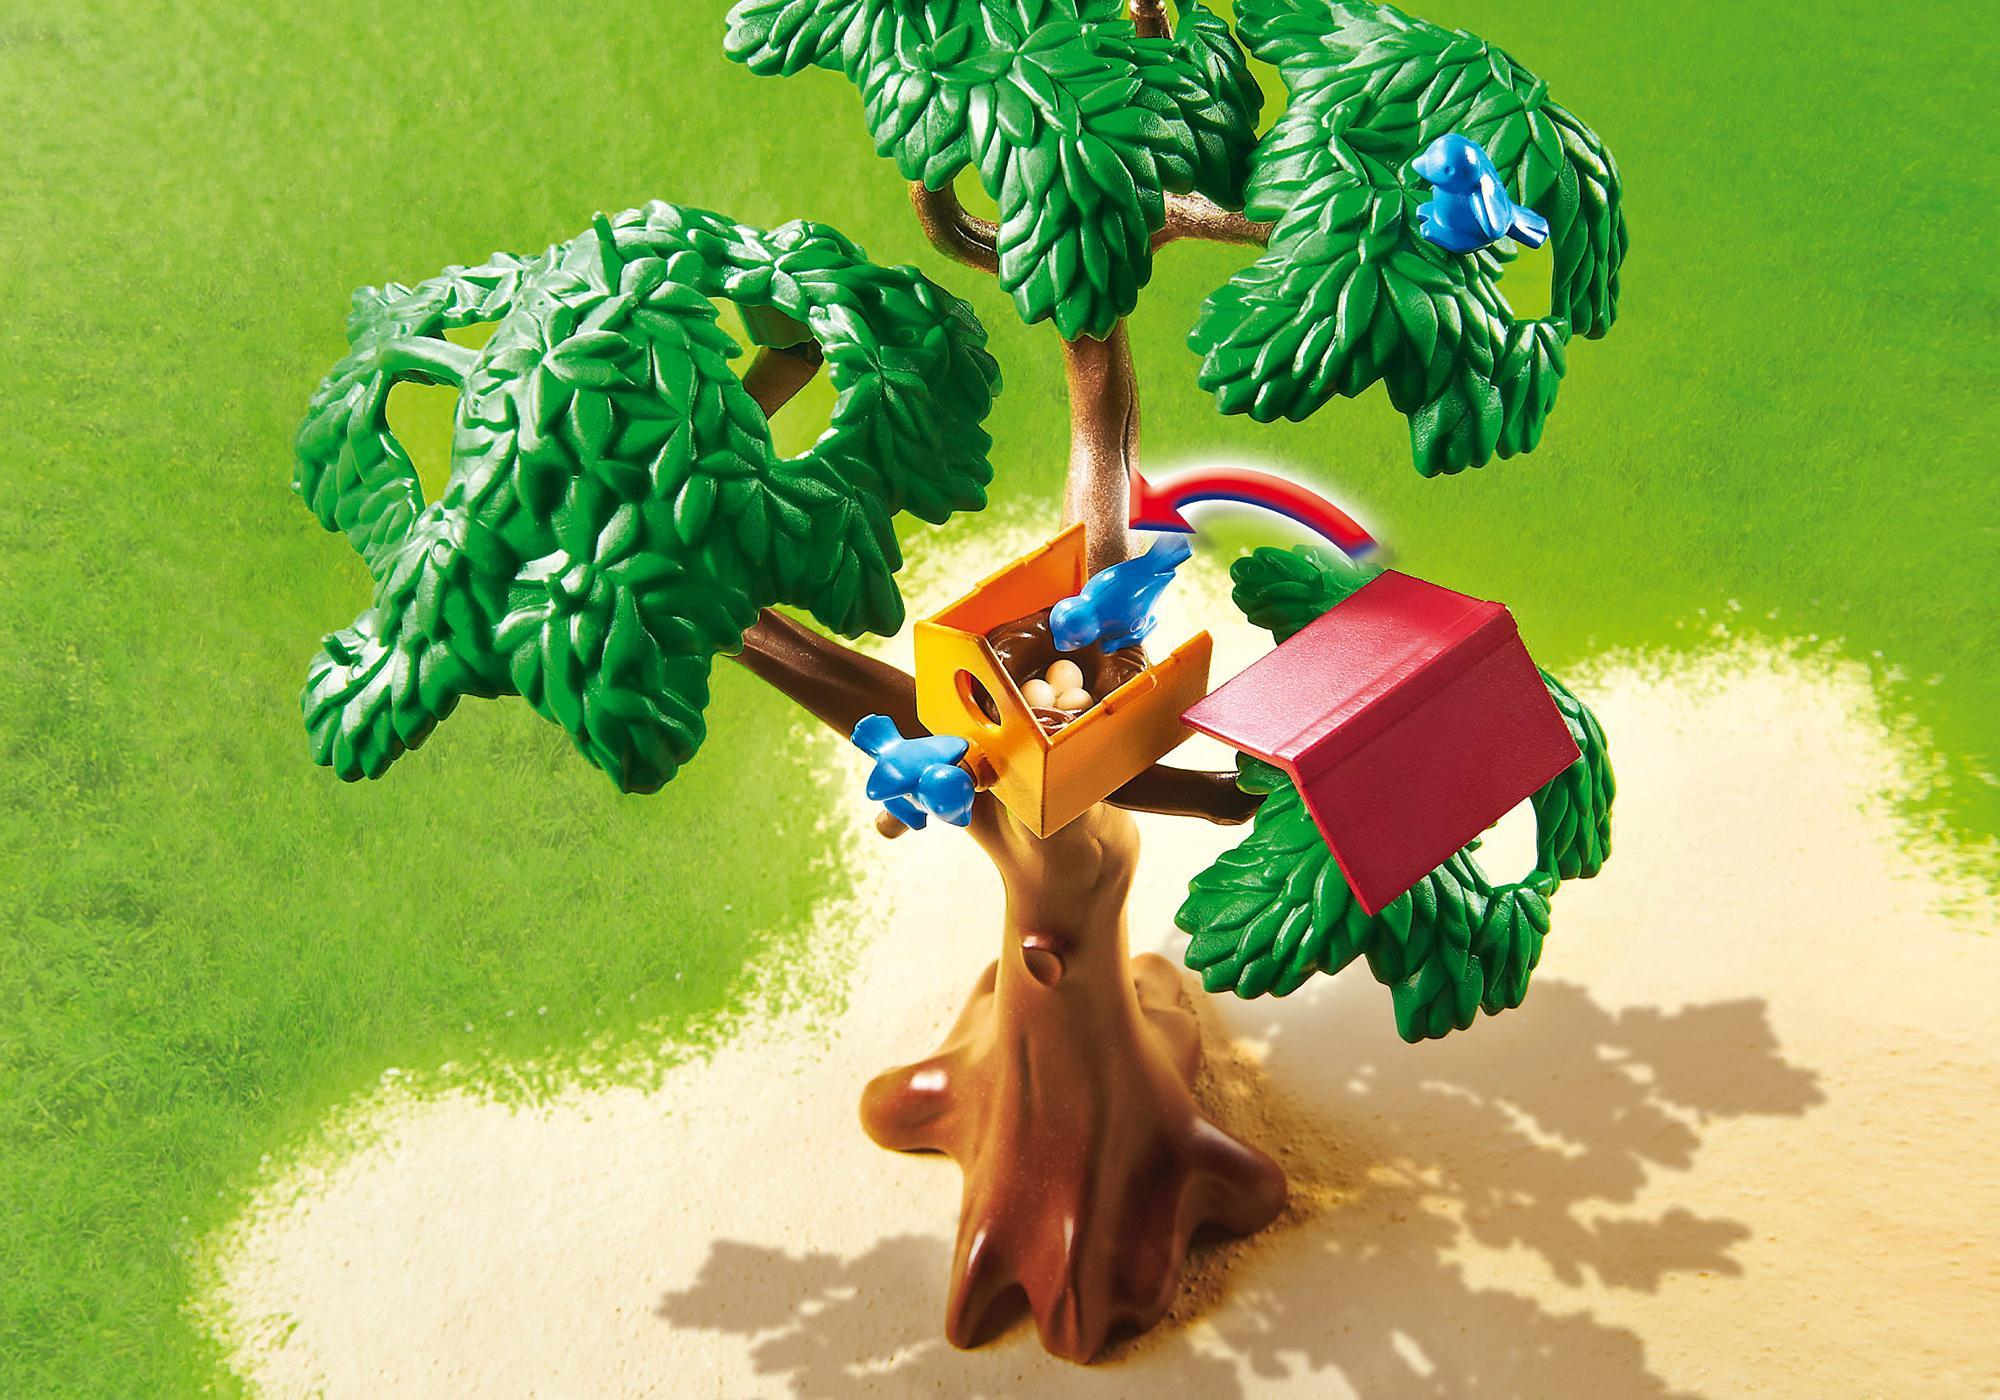 http://media.playmobil.com/i/playmobil/6811_product_extra3/Forsthaus